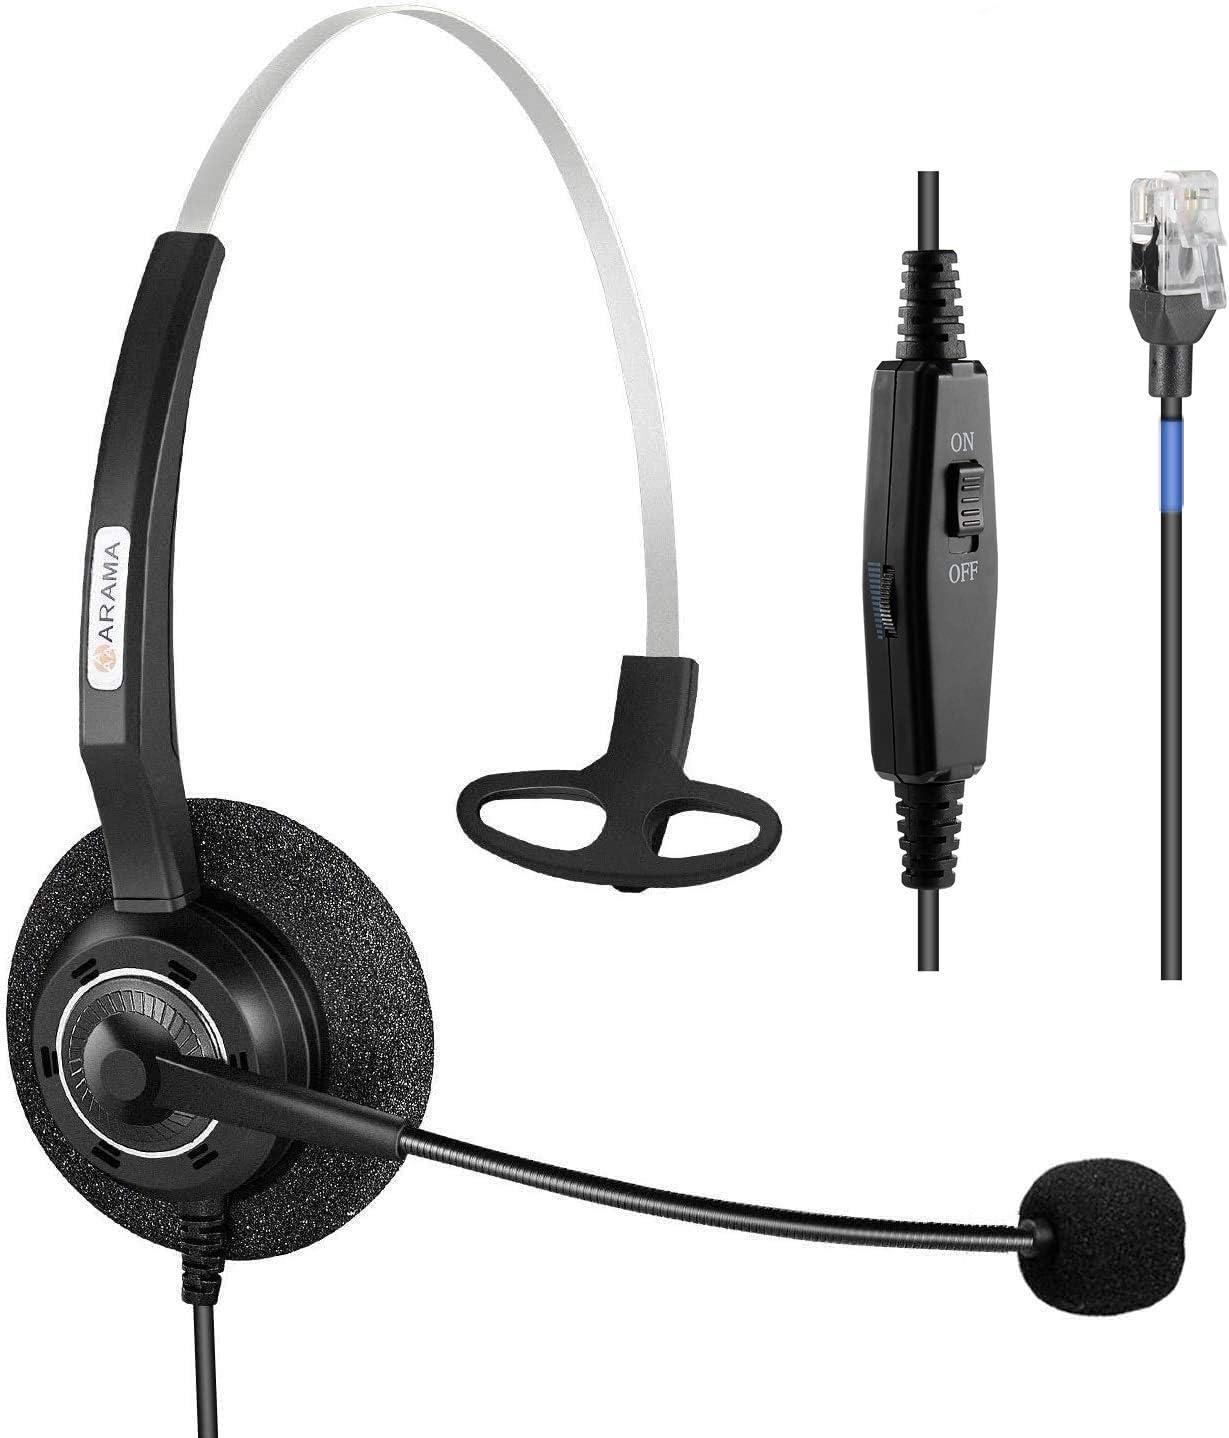 Arama Phone Headset RJ9 with Pro Noise Canceling Mic and Mute Switch Controls Wired Headset for Polycom Mitel Plantronic Nortel Shoretel Aastra Avaya Lucent Landline Phones-200MS2